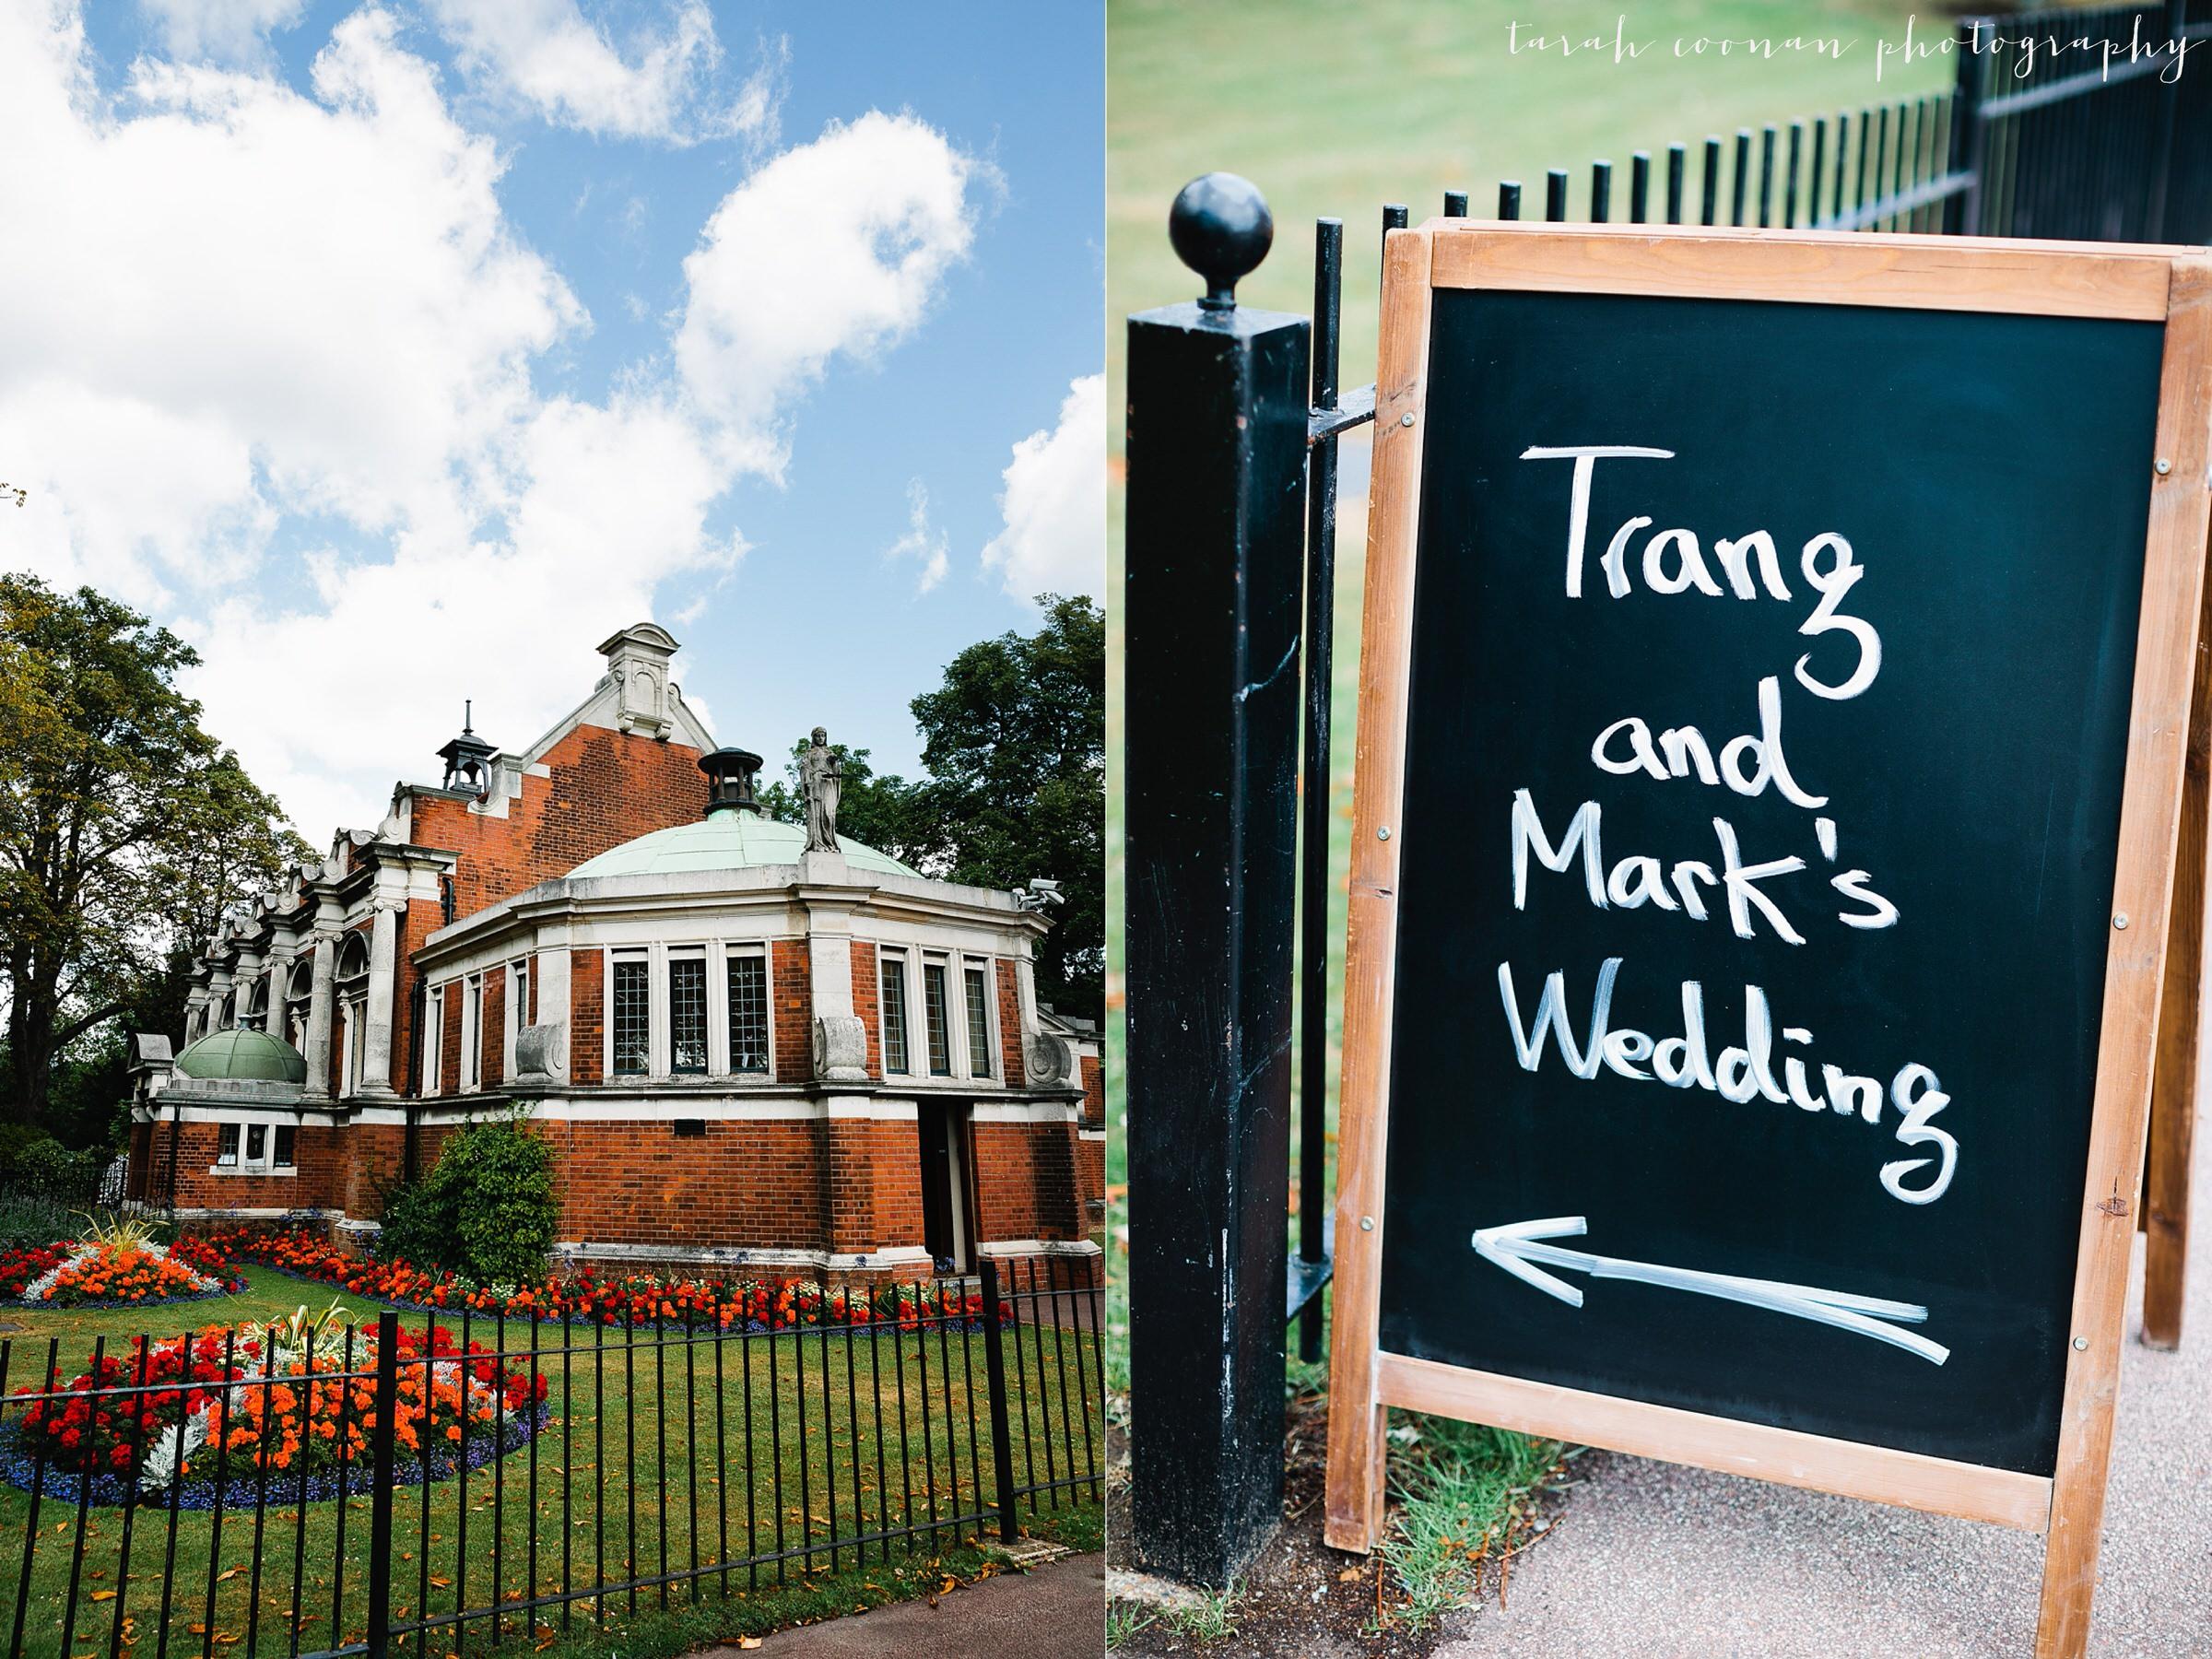 south london wedding venue